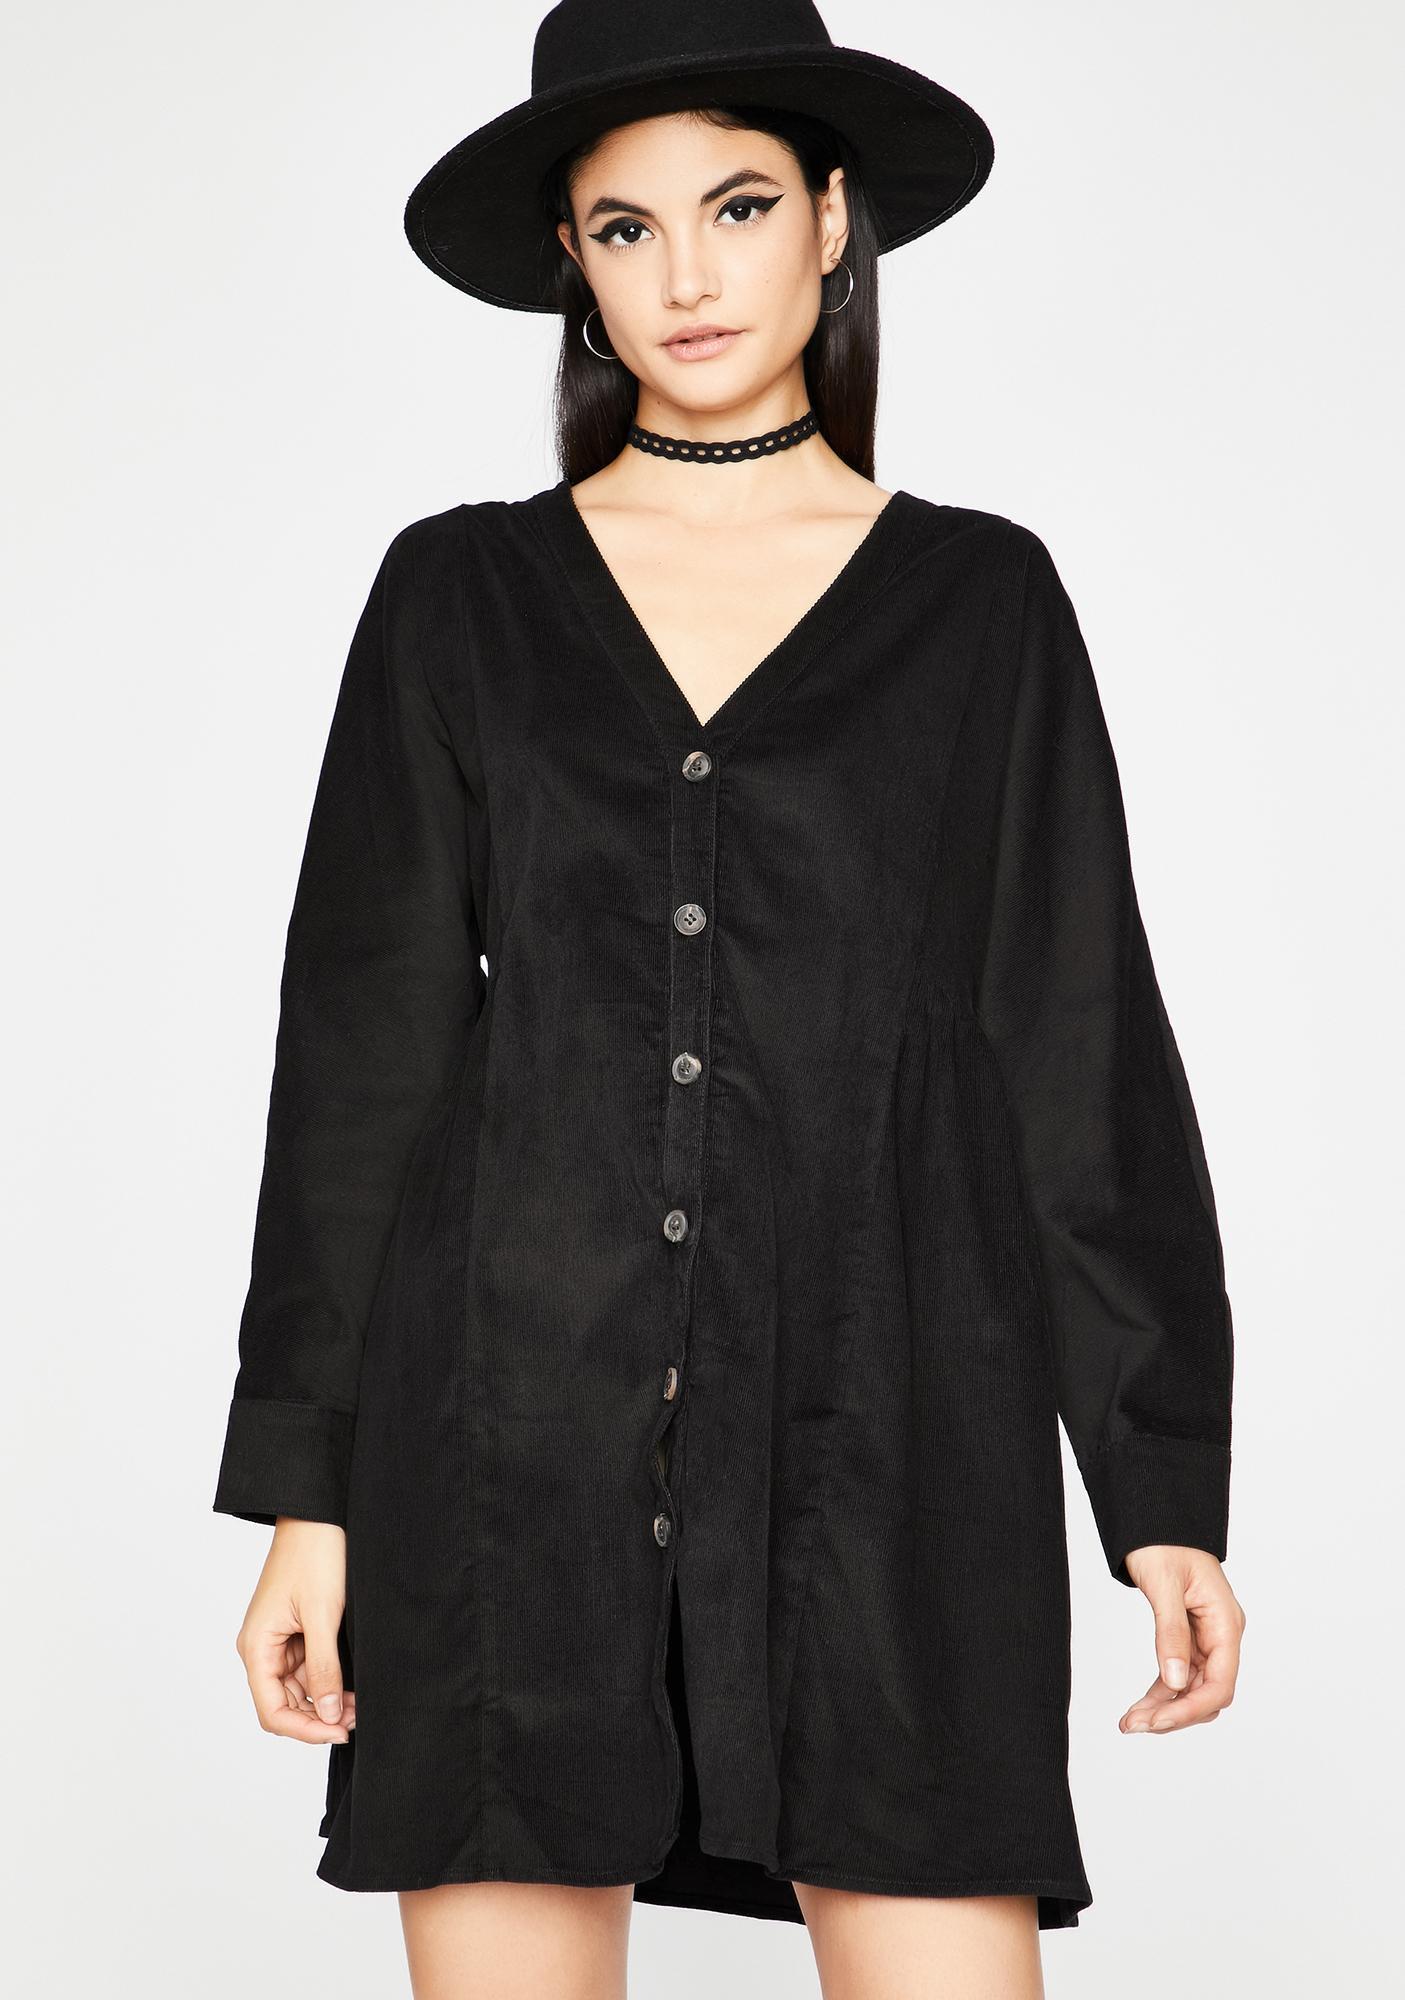 Livin' Bohemian Shirt Dress